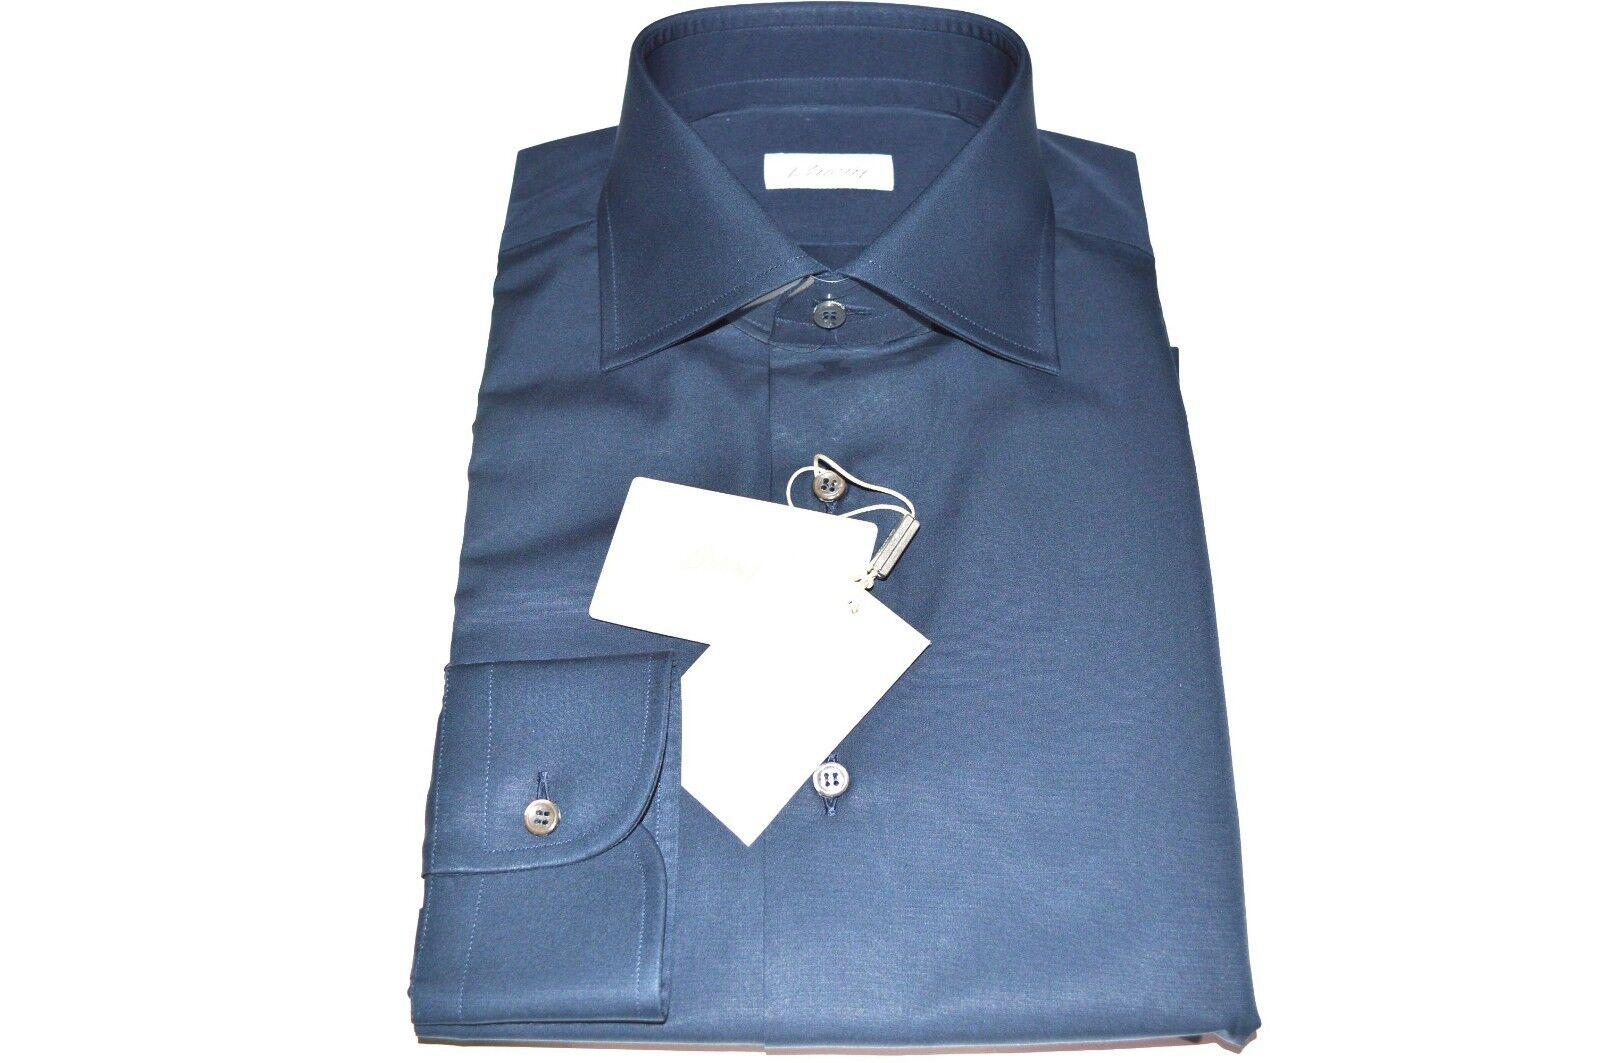 NEW  BRIONI Dress Blau hemd 100% baumwolle Größe 17.75  Us 45 Eu(Cod MA22)